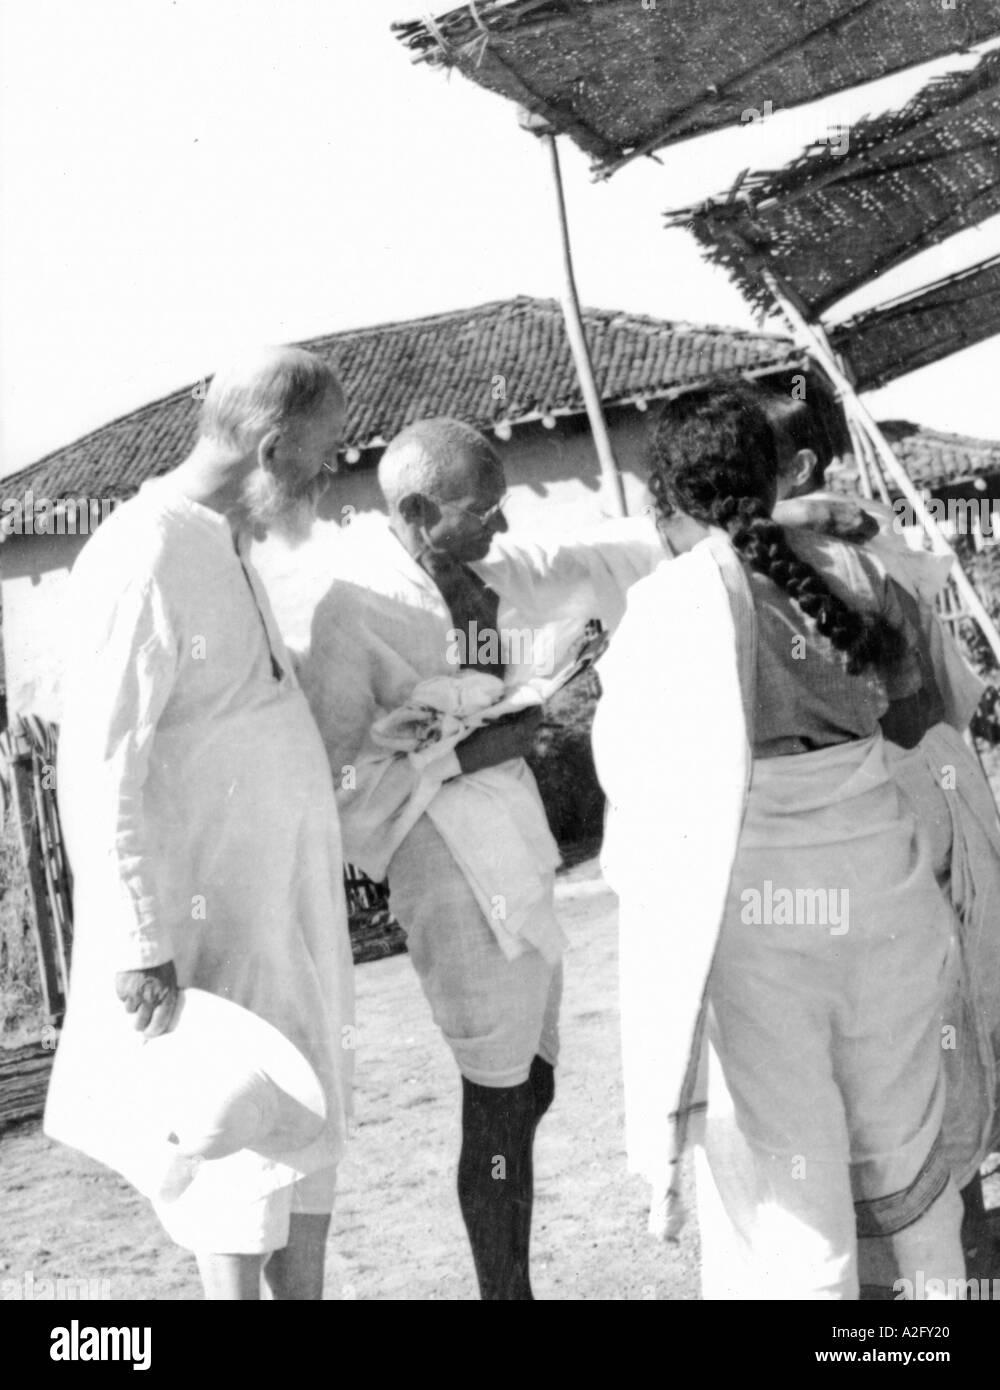 Il Mahatma Gandhi con Charles Freer Andrews a Segaon, Khargone, Madhya Pradesh, India, Dicembre 1938 Immagini Stock